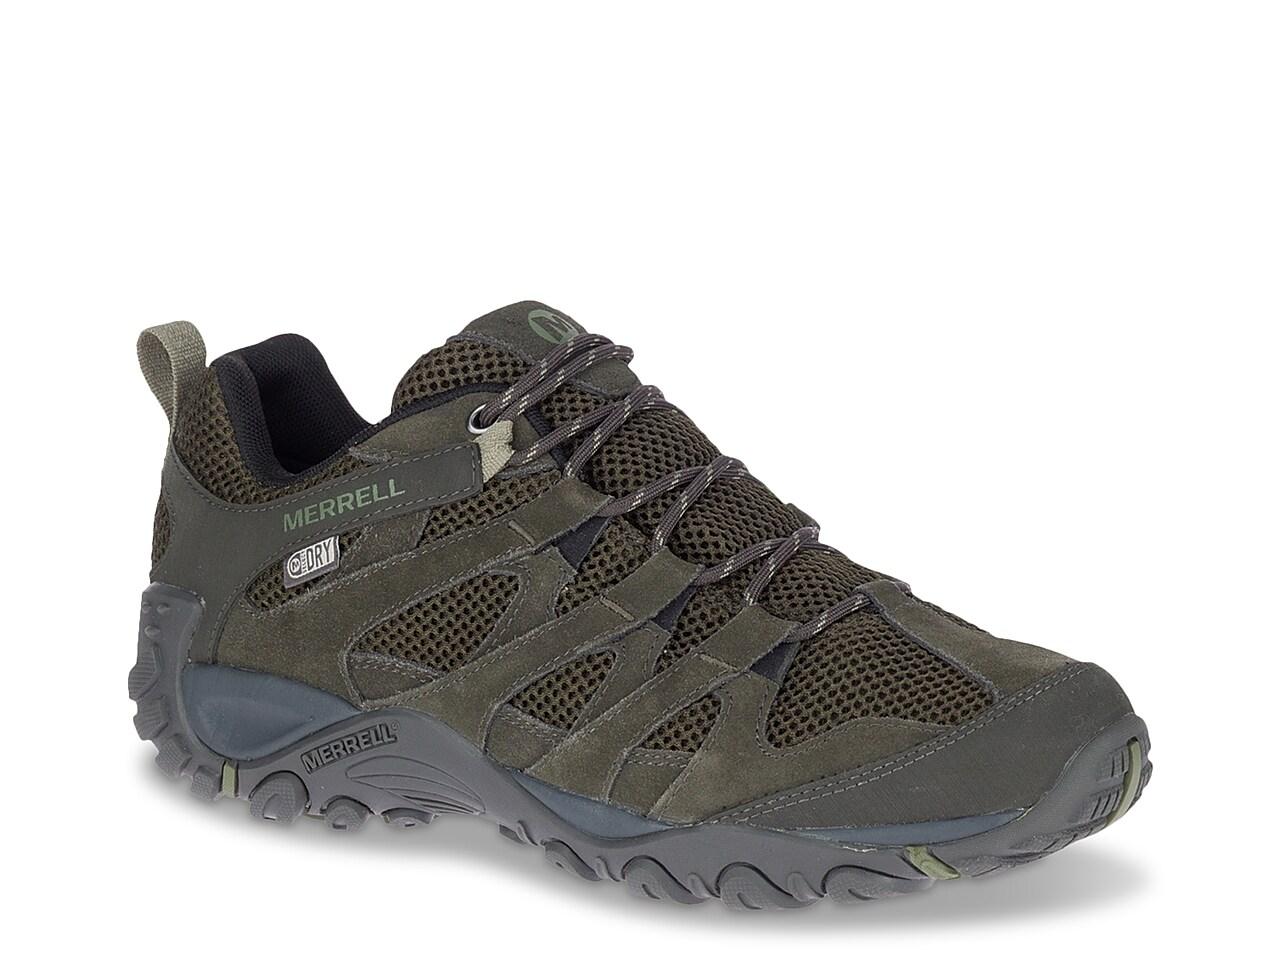 Merrell Mens Alverstone Hiking Shoe